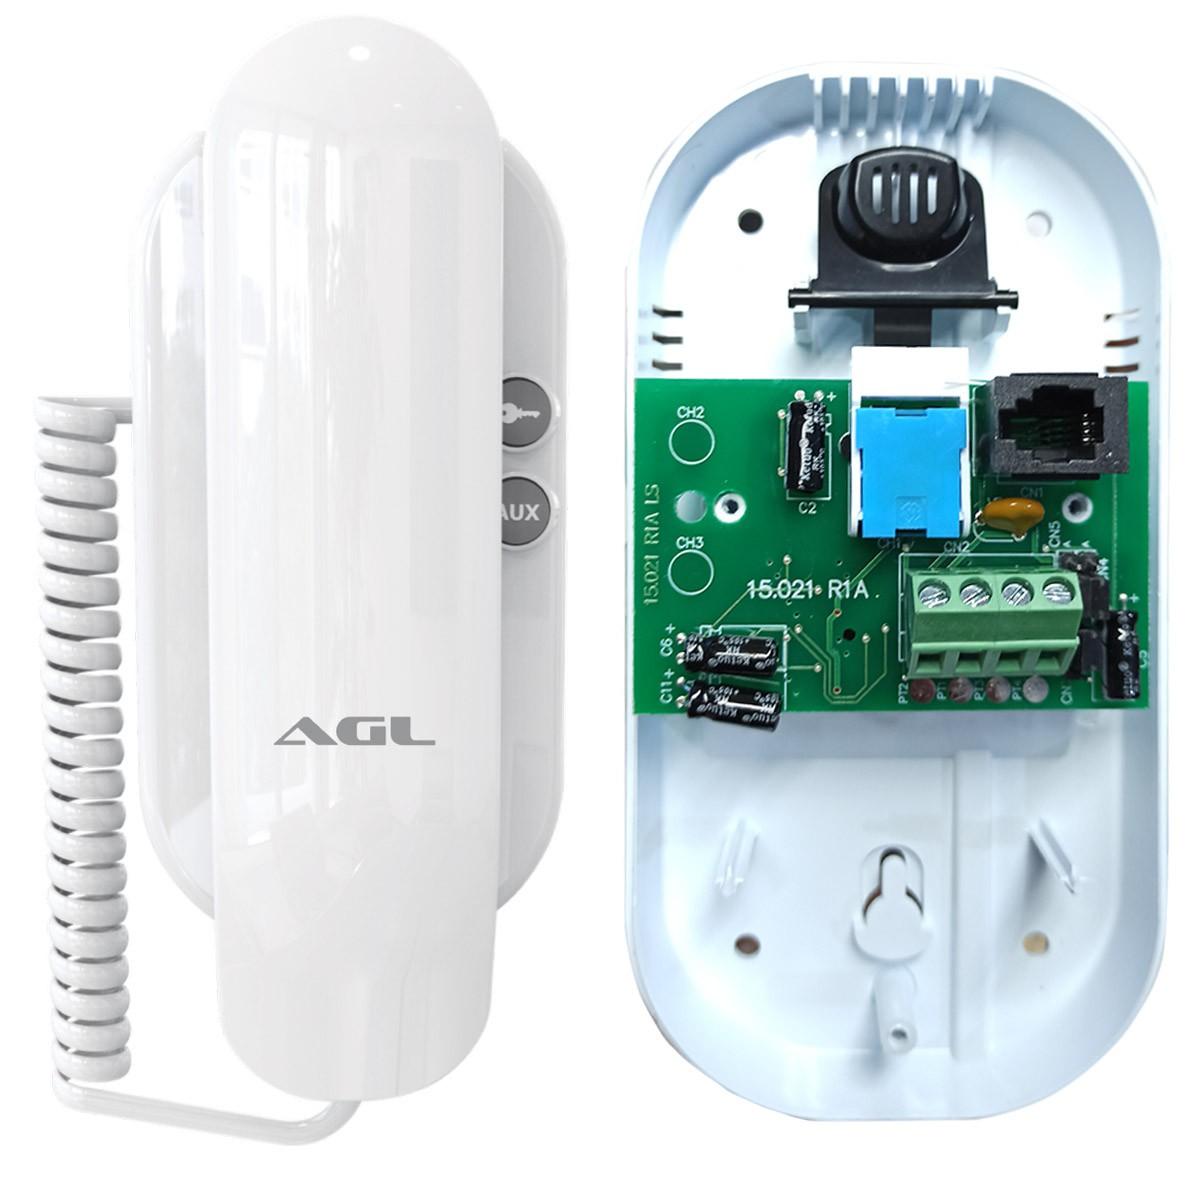 Kit Porteiro Eletrônico Agl P10S + Fechadura Elétrica Agl + Cabo de 20 mts